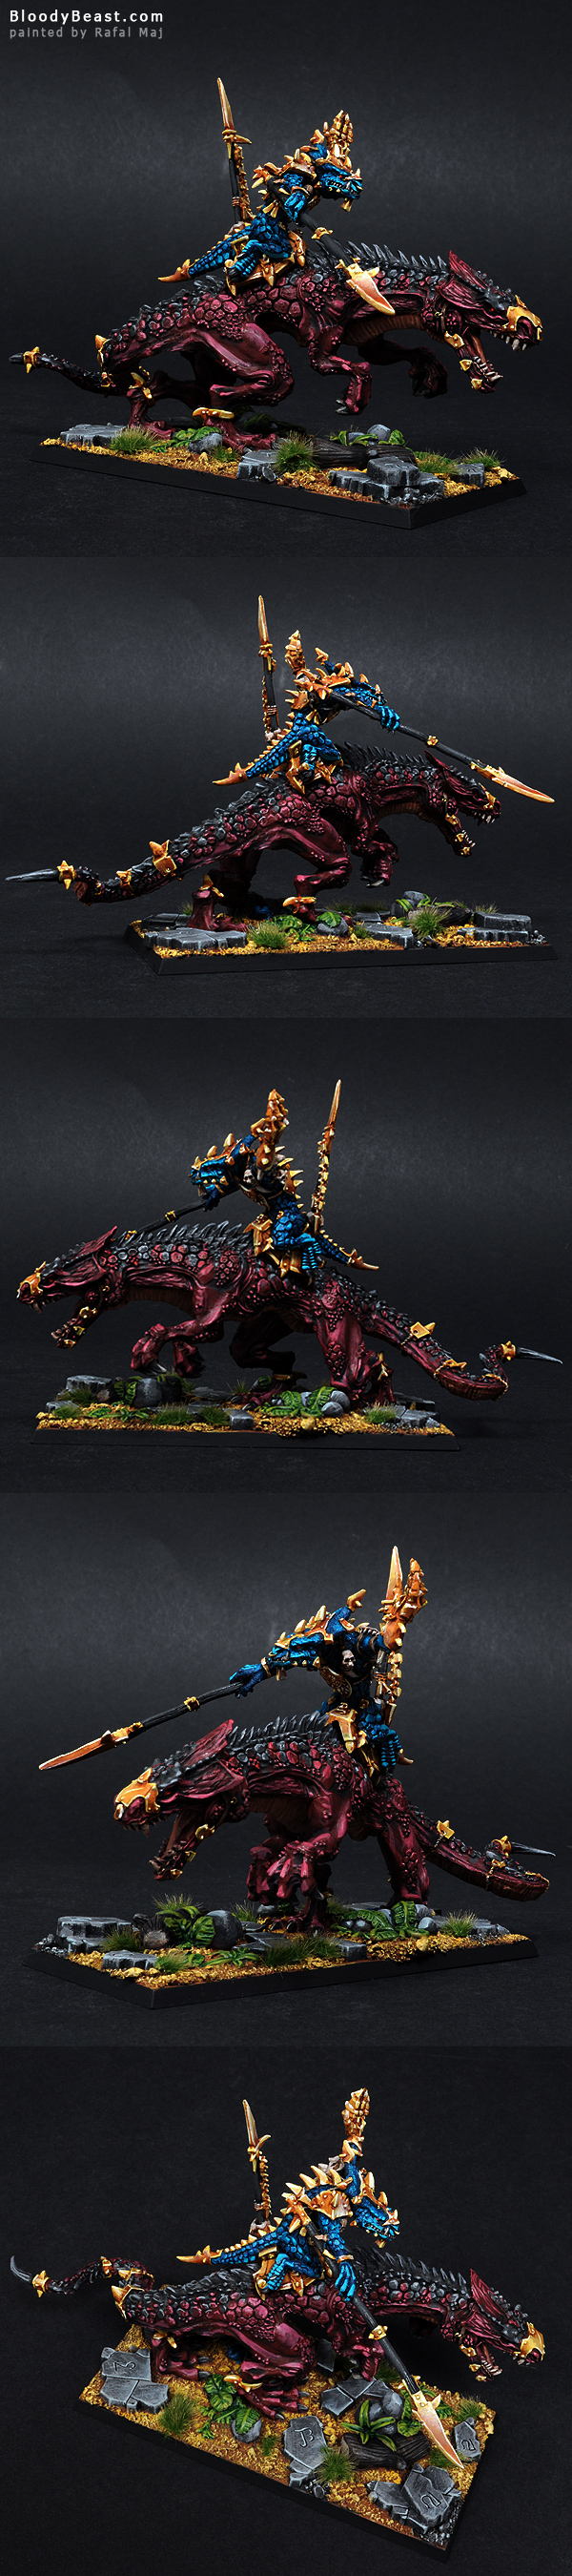 Lizardmen Ancient Scar Leader Kroq Gar painted by Rafal Maj (BloodyBeast.com)